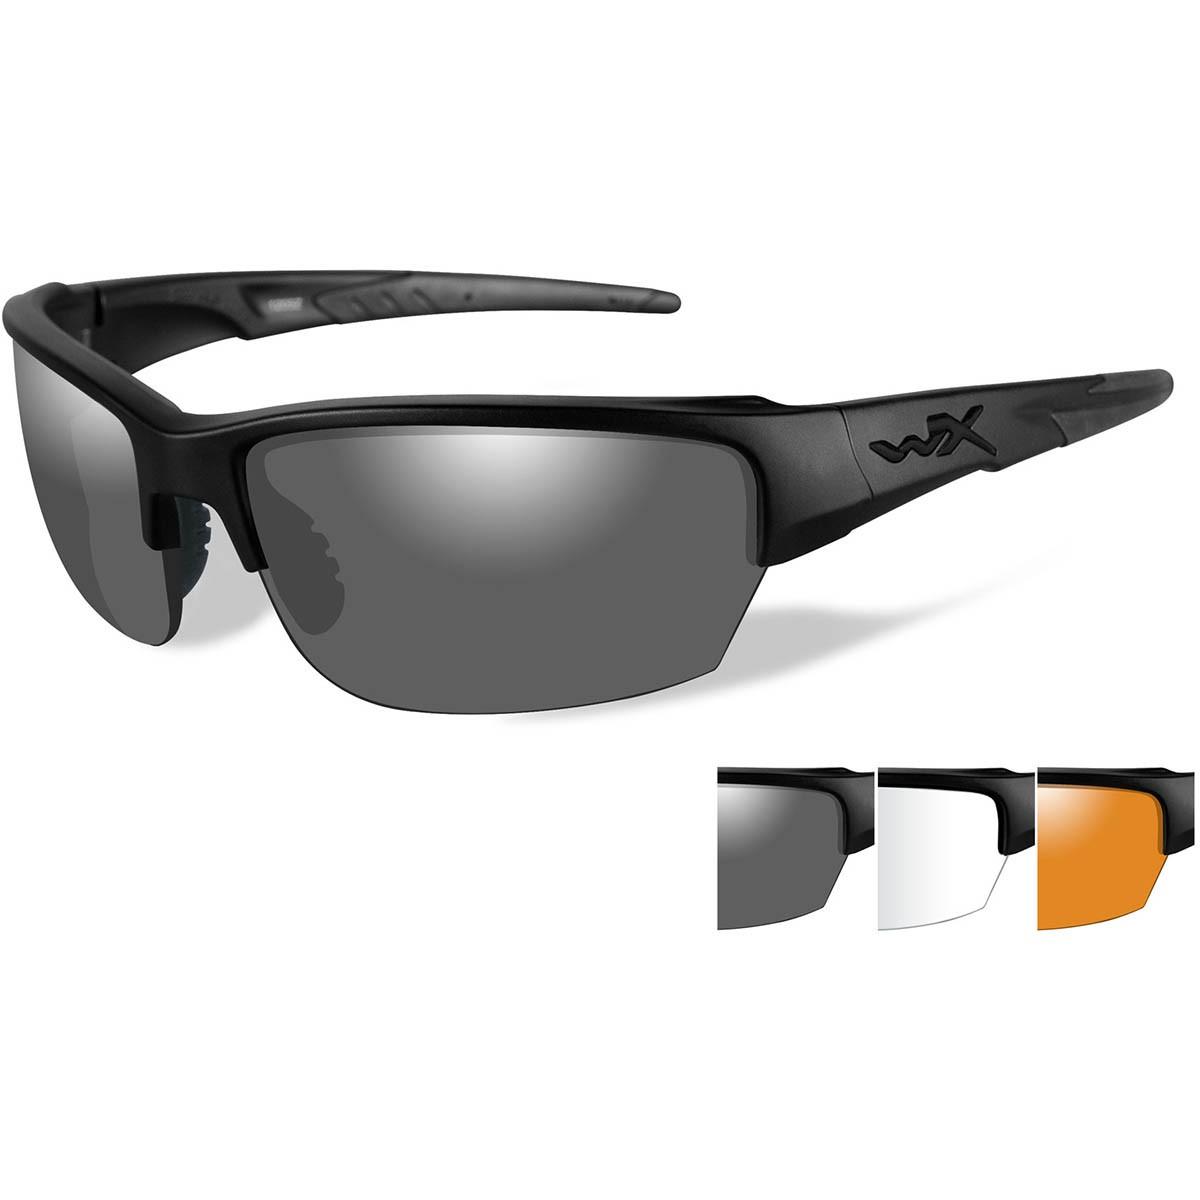 WileyxCHSAI06 WX Saint Safety Glasses - Matte Black ...